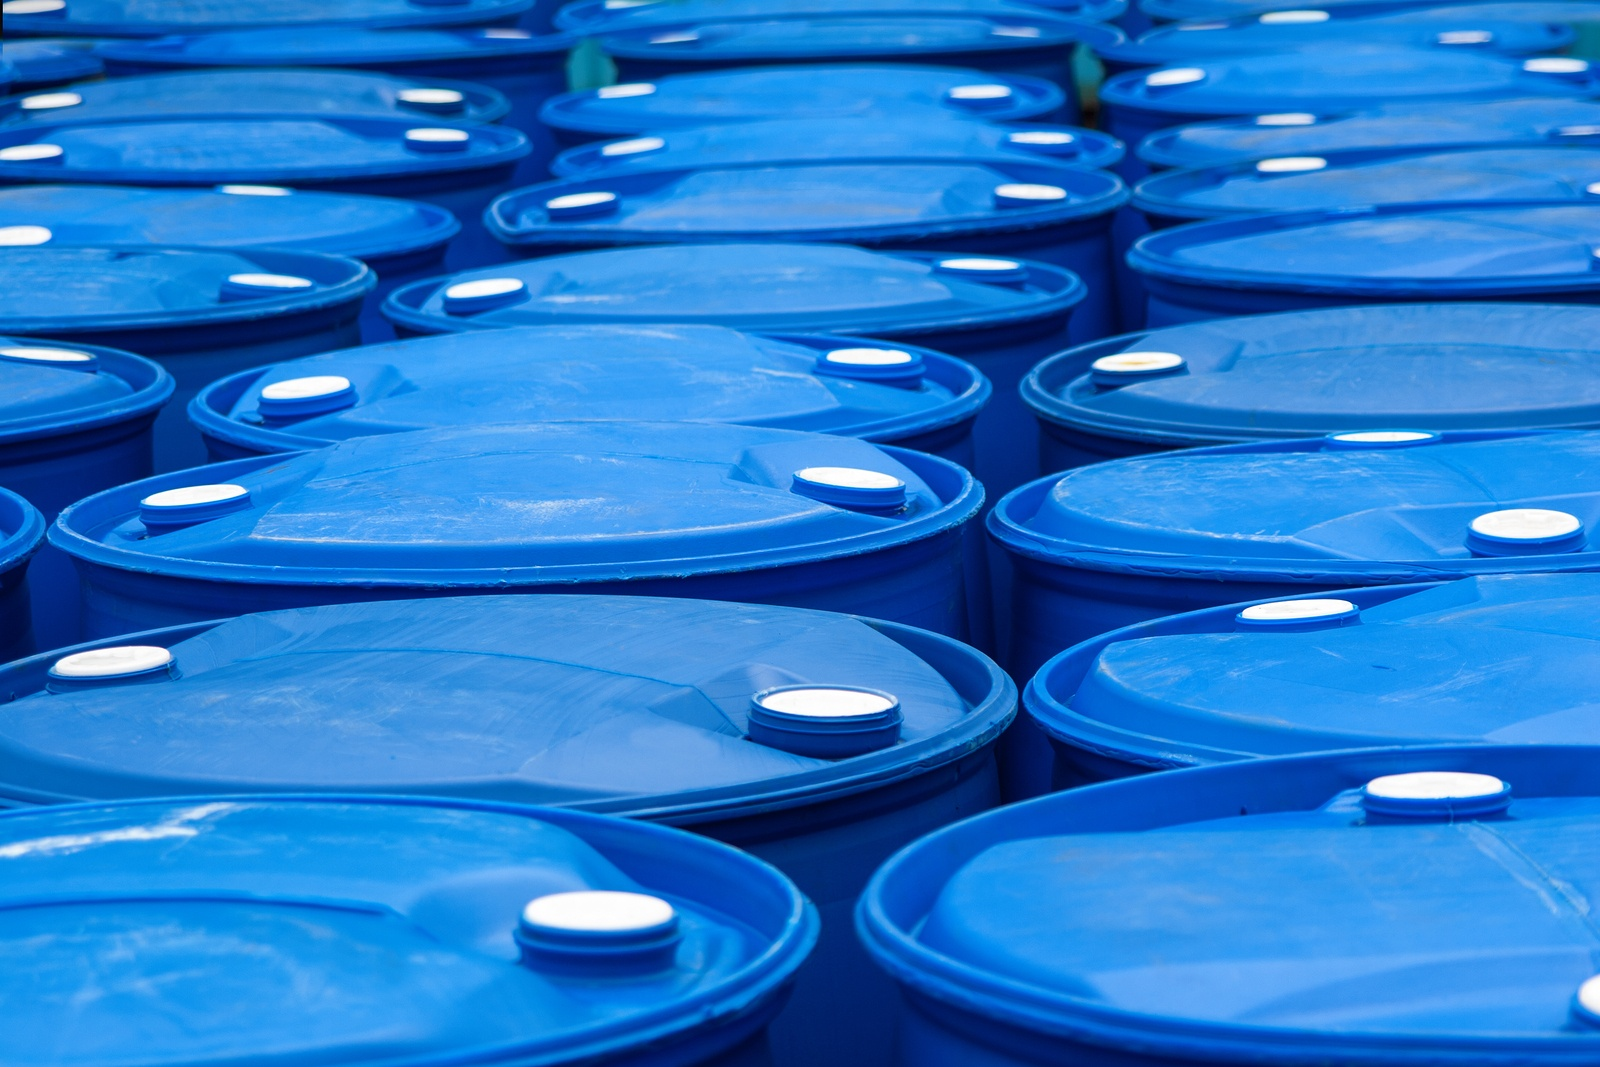 bigstock-Blue-Barrels-39676309.jpg